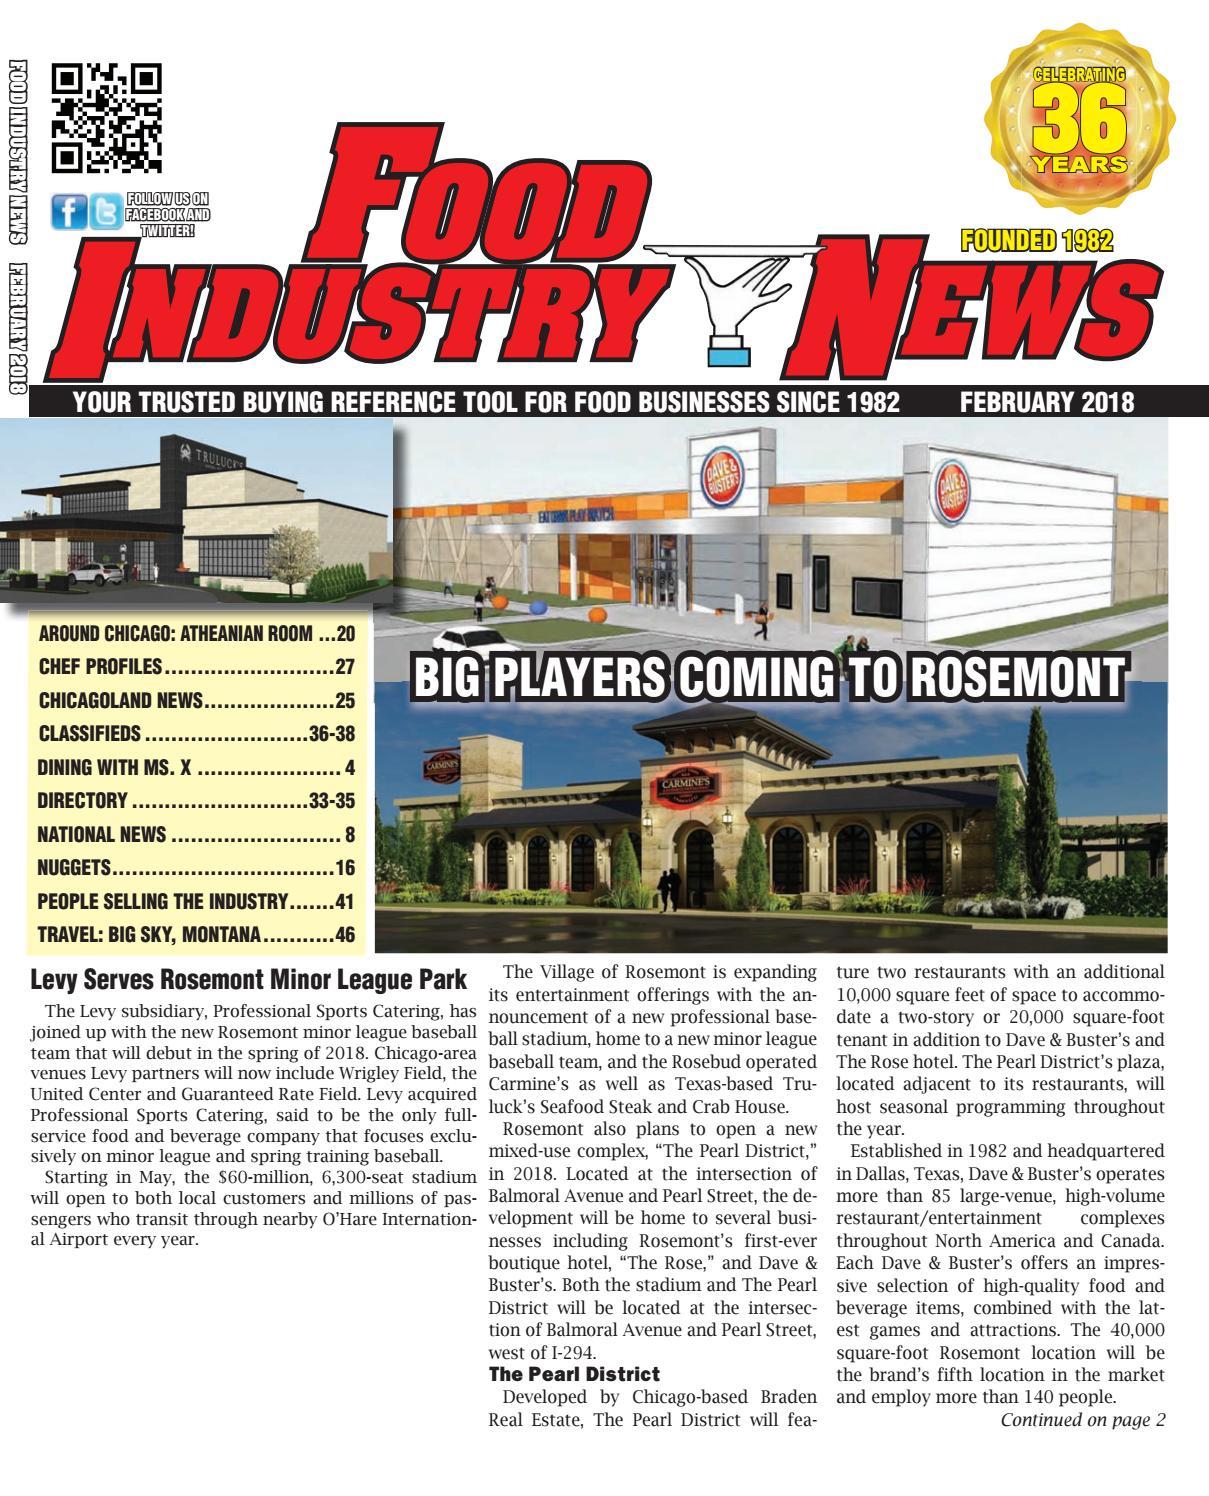 February 2018 fin web edition by FoodIndustryNews issuu